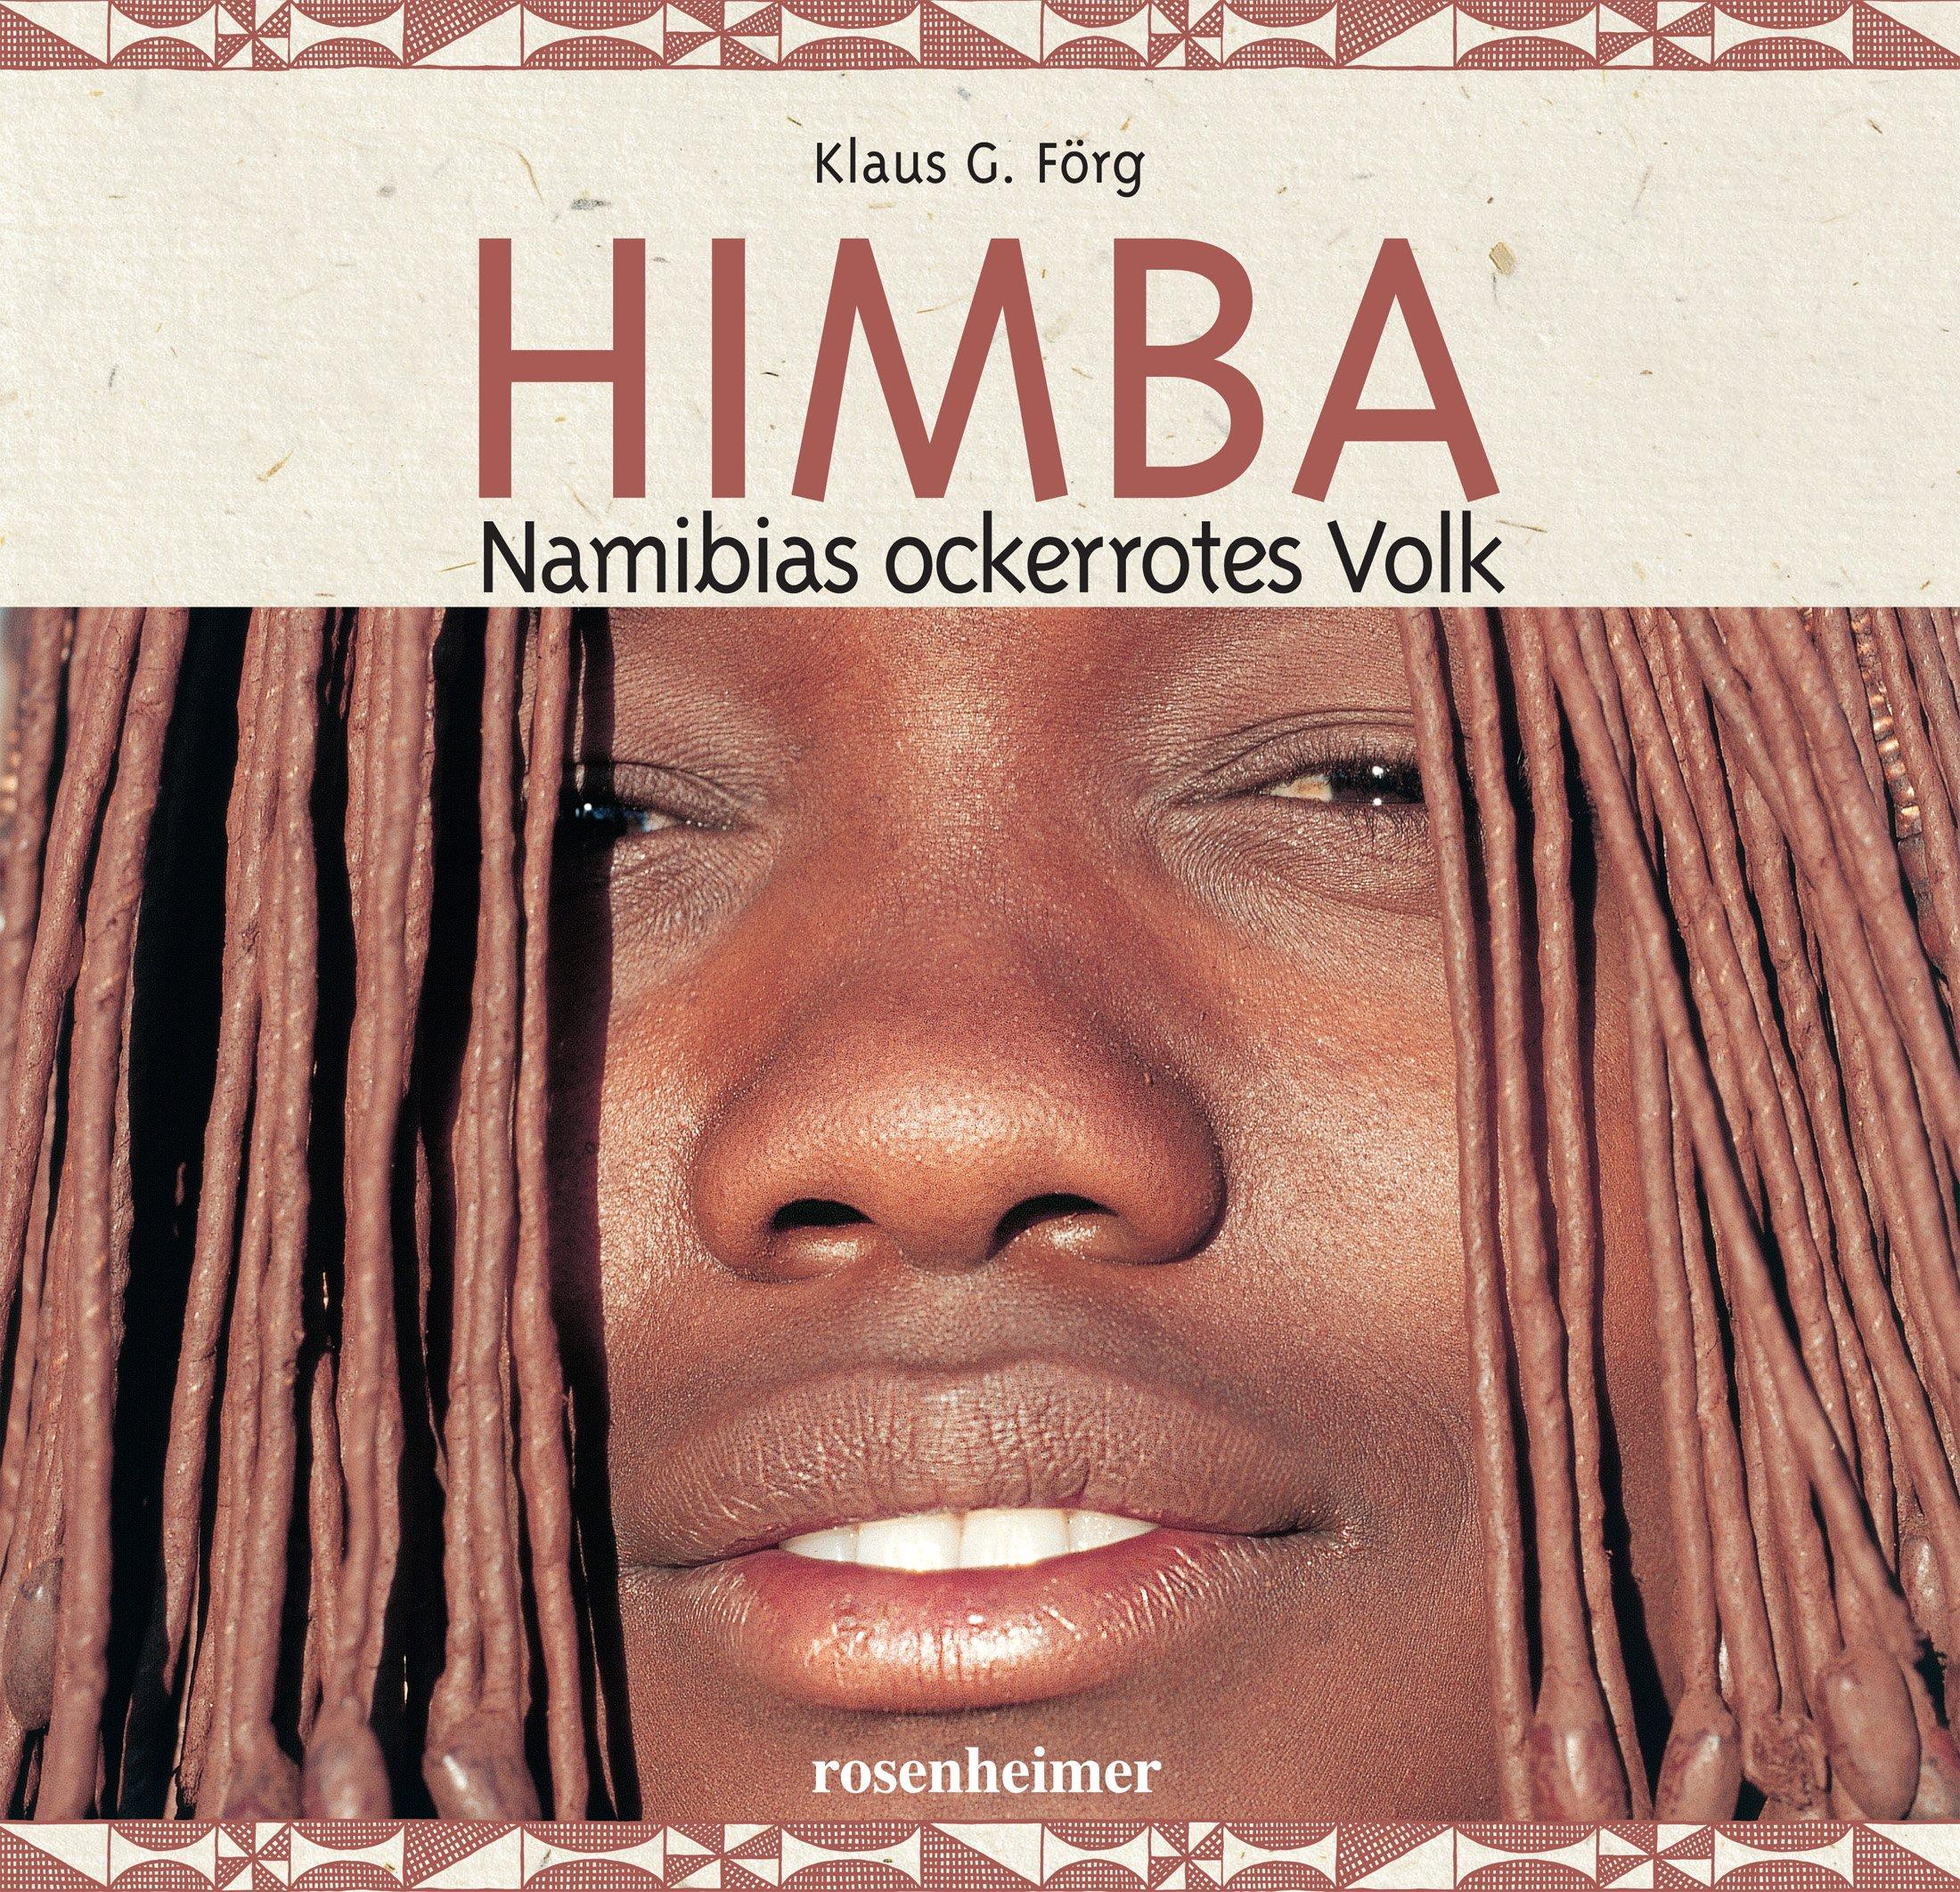 Himba - Namibias ockerrotes Volk, Mit CD